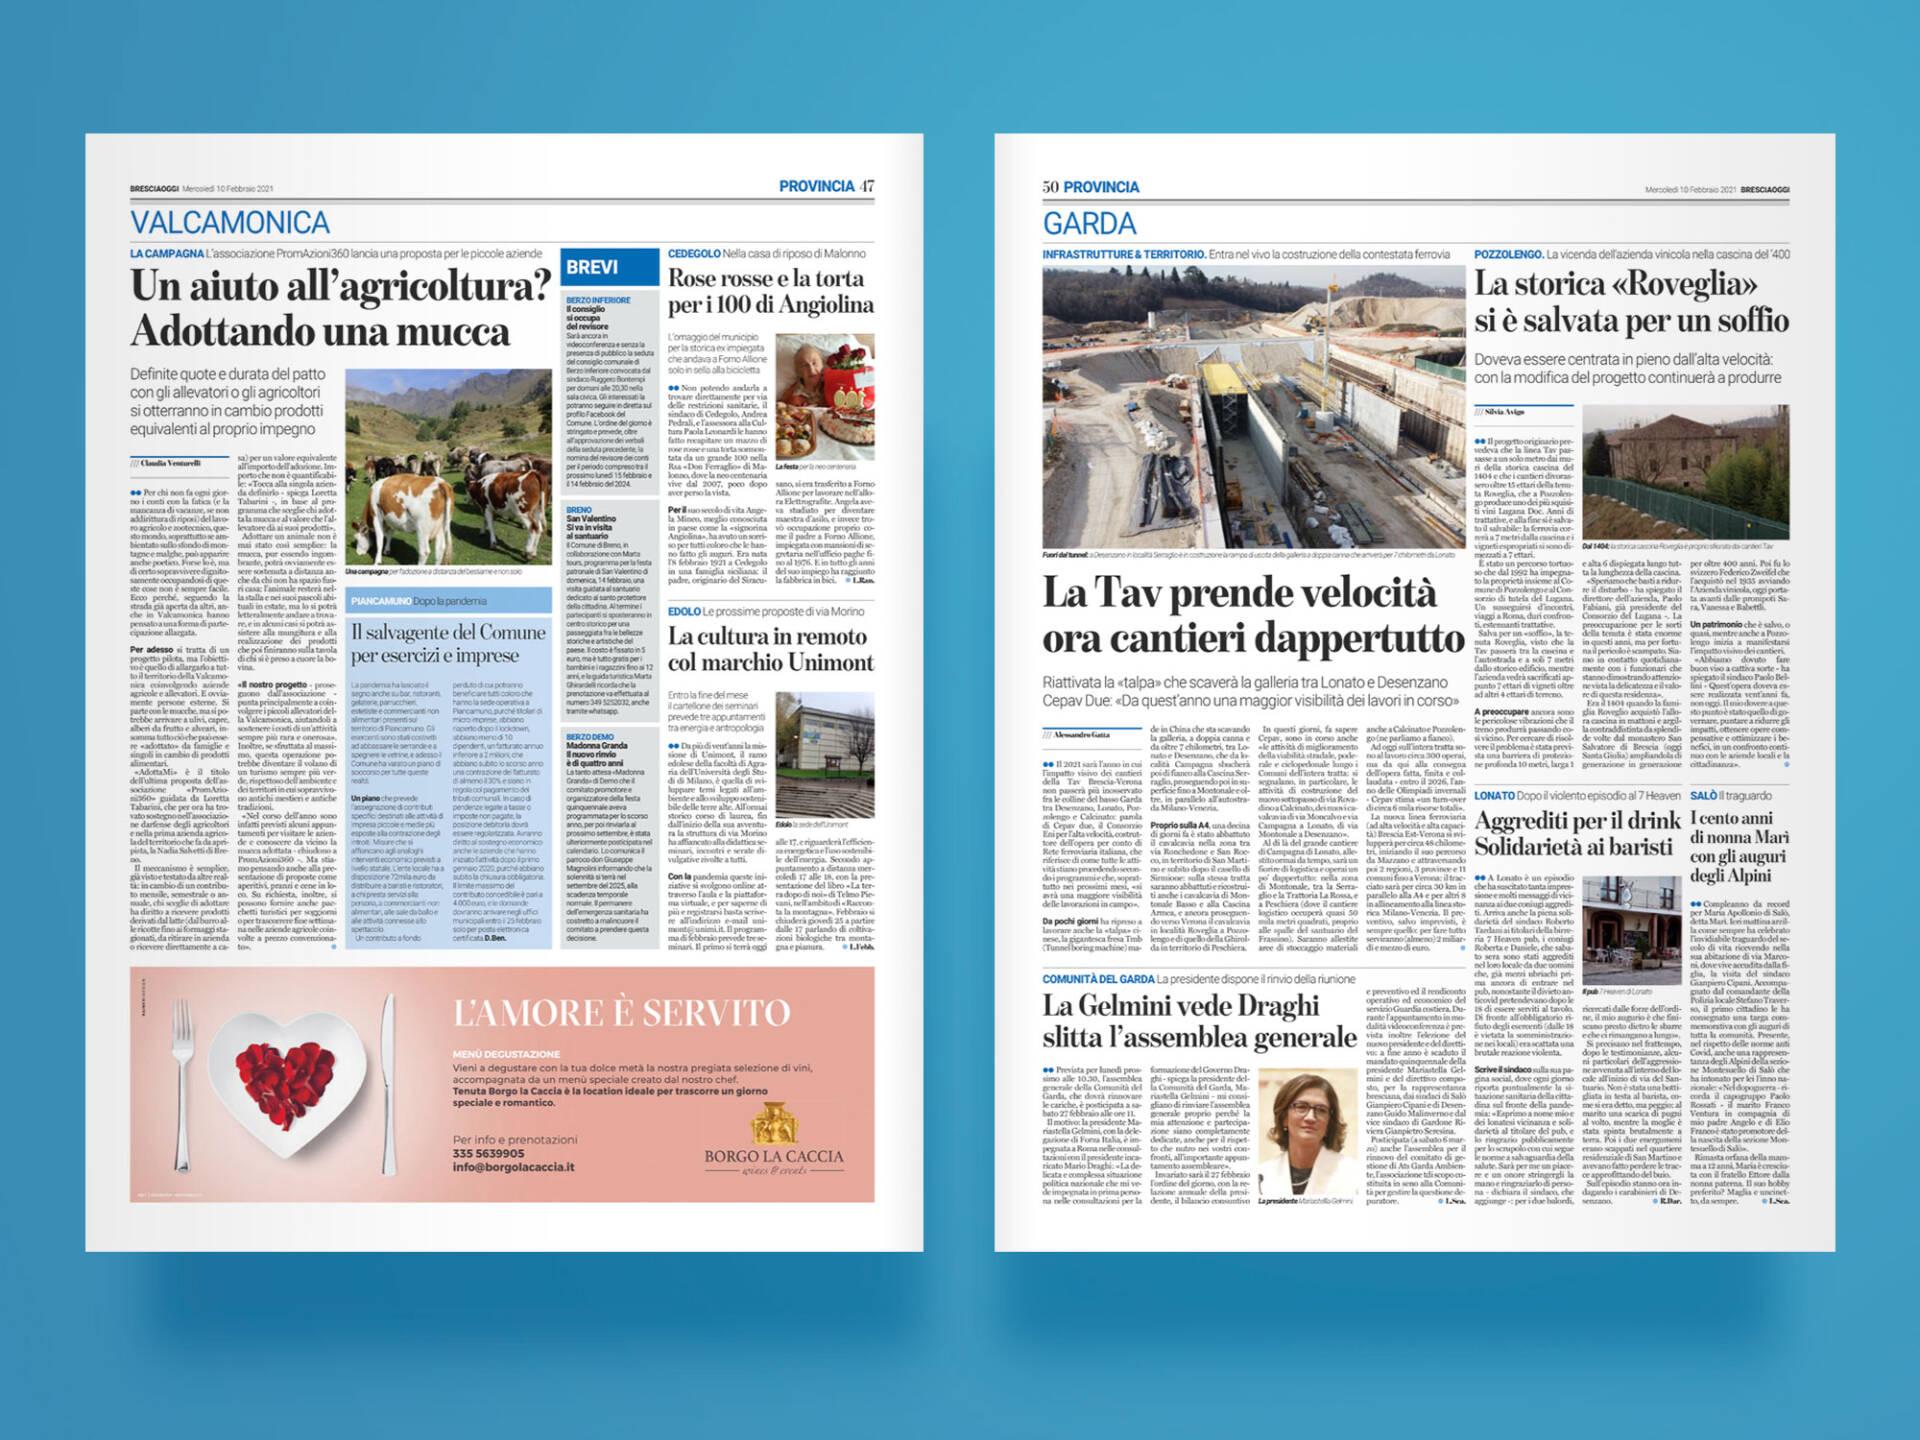 BresciaOggi_042021_Wenceslau_News_Design